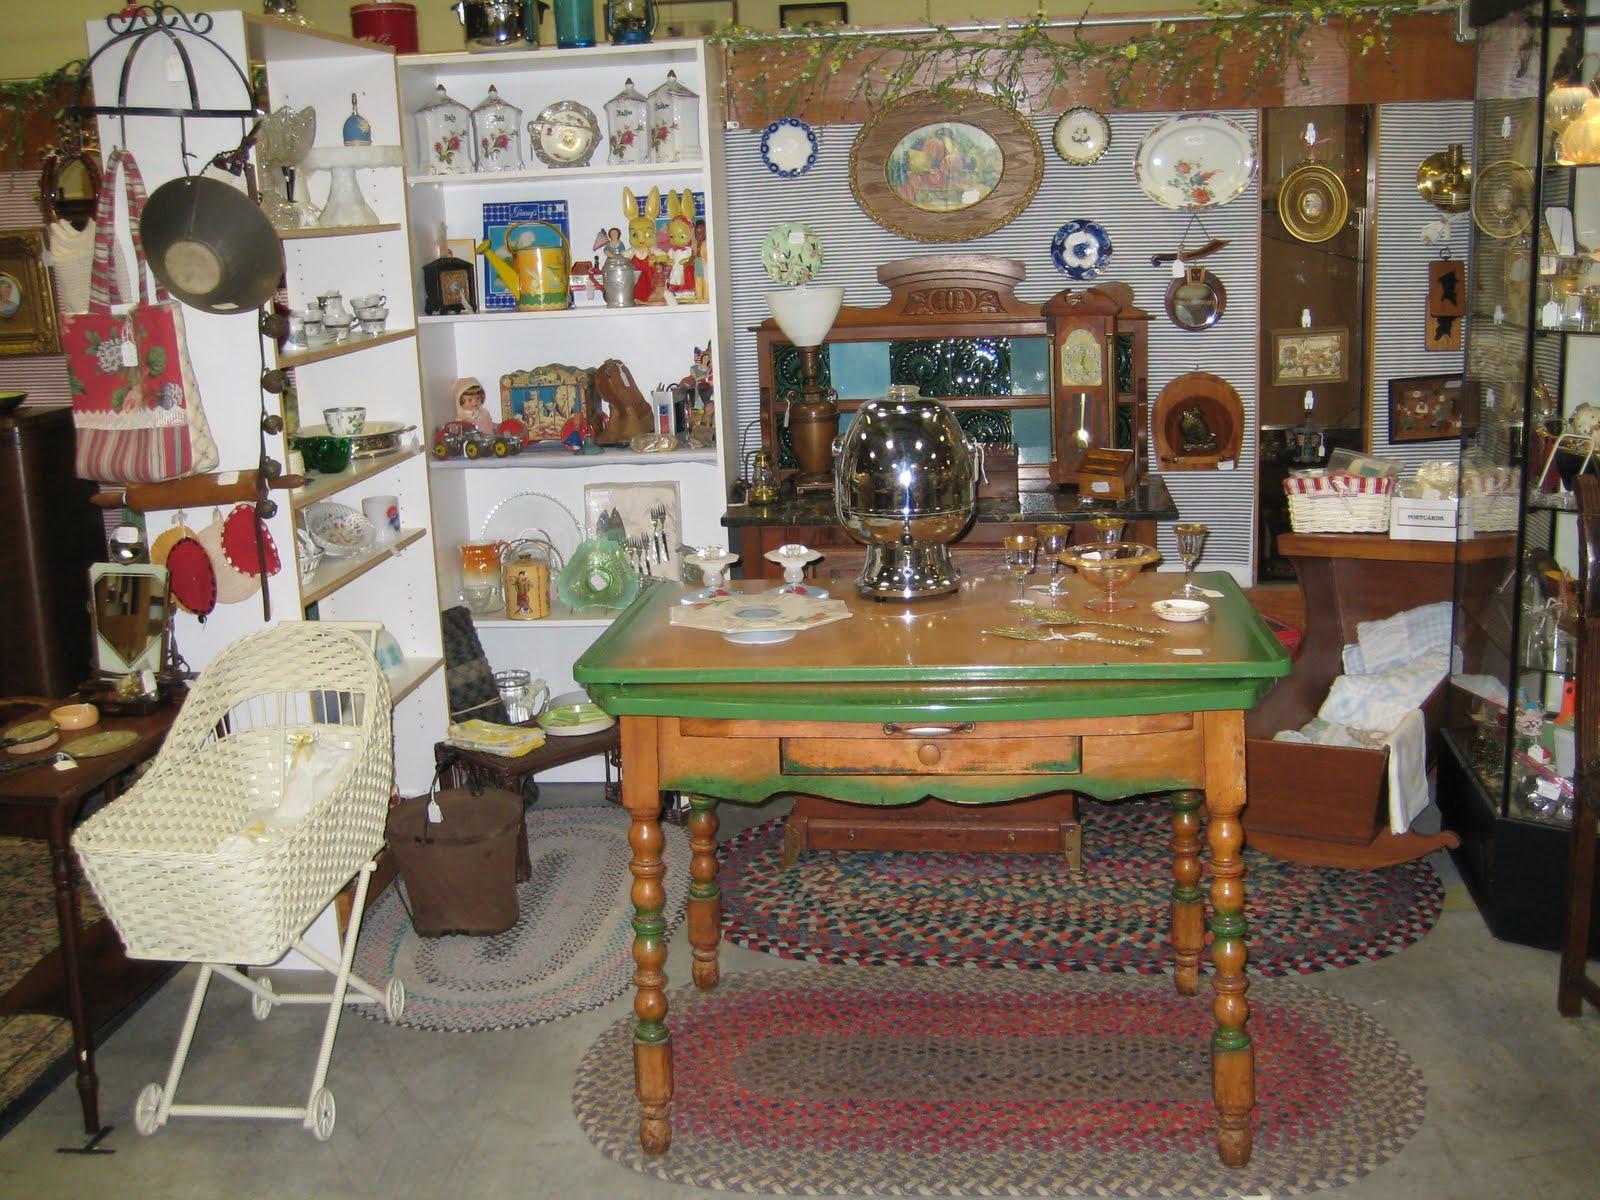 C Dianne Zweig Kitsch n Stuff Antique Booth Display Ideas The Importance Of Planning